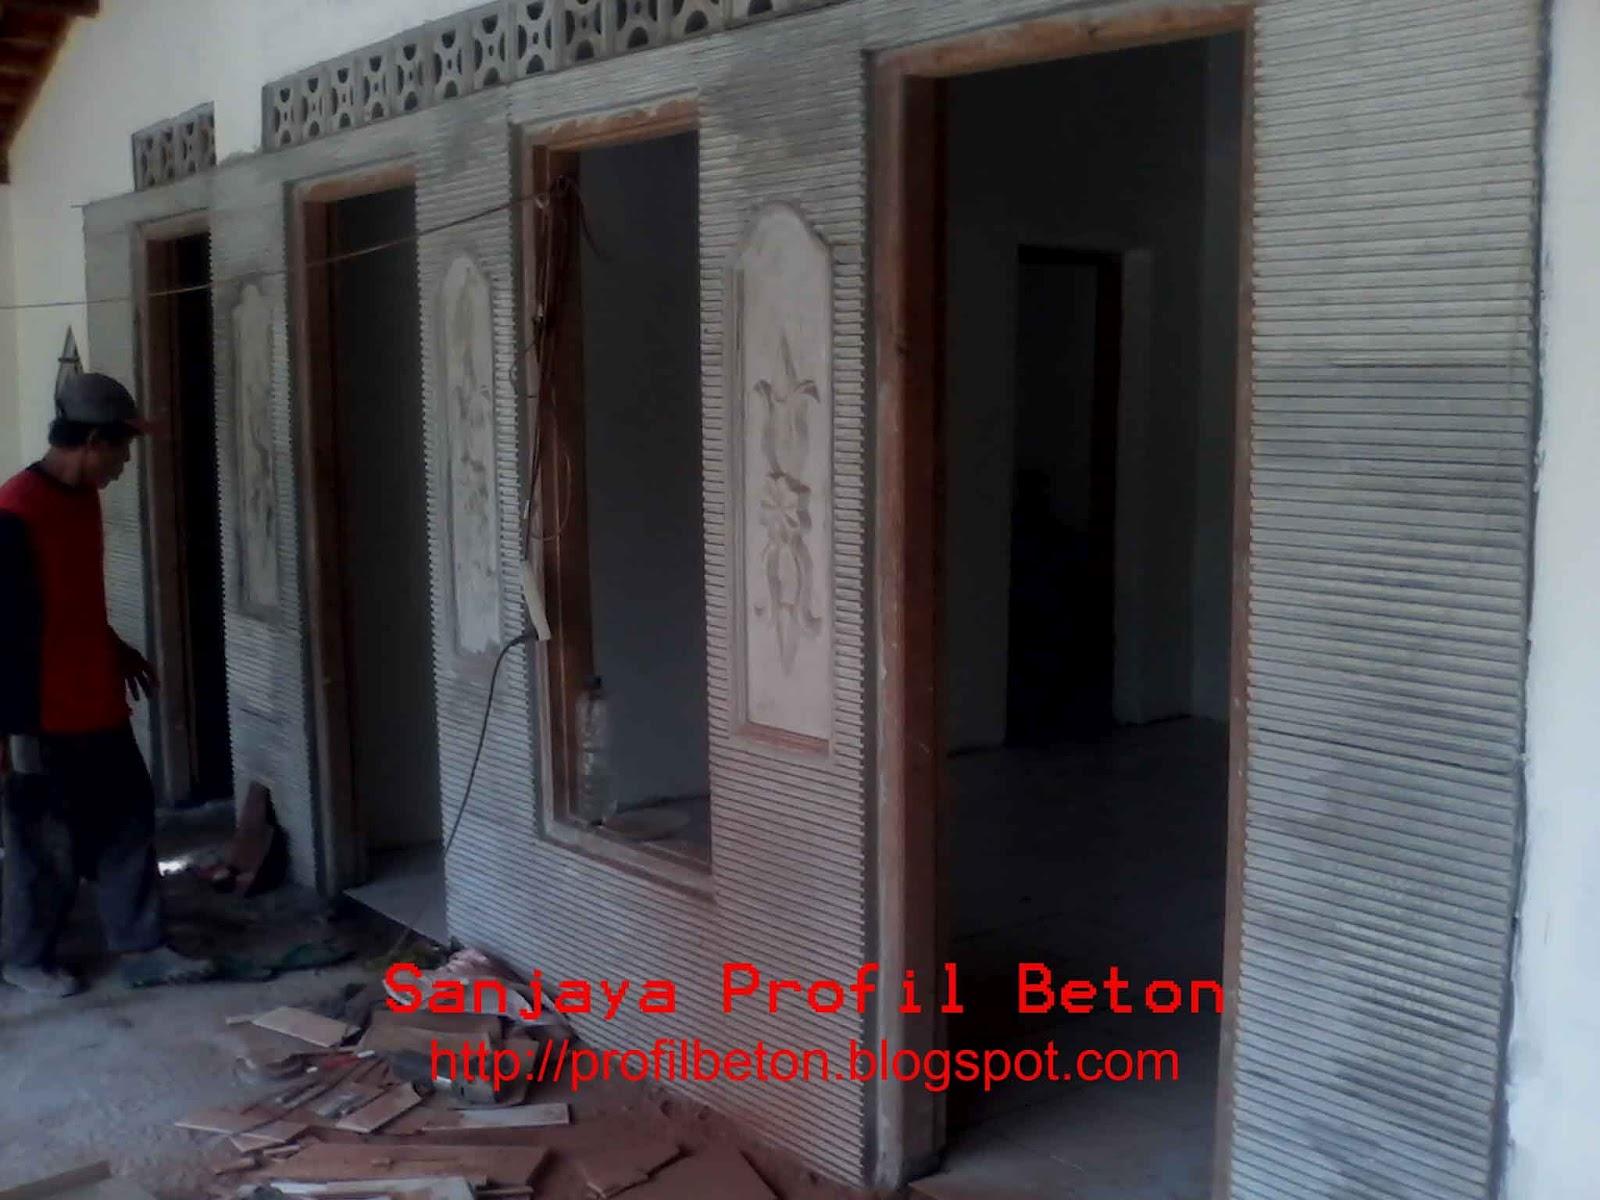 sanjaya profil beton photo apilkasi produk sanjaya profil. Black Bedroom Furniture Sets. Home Design Ideas